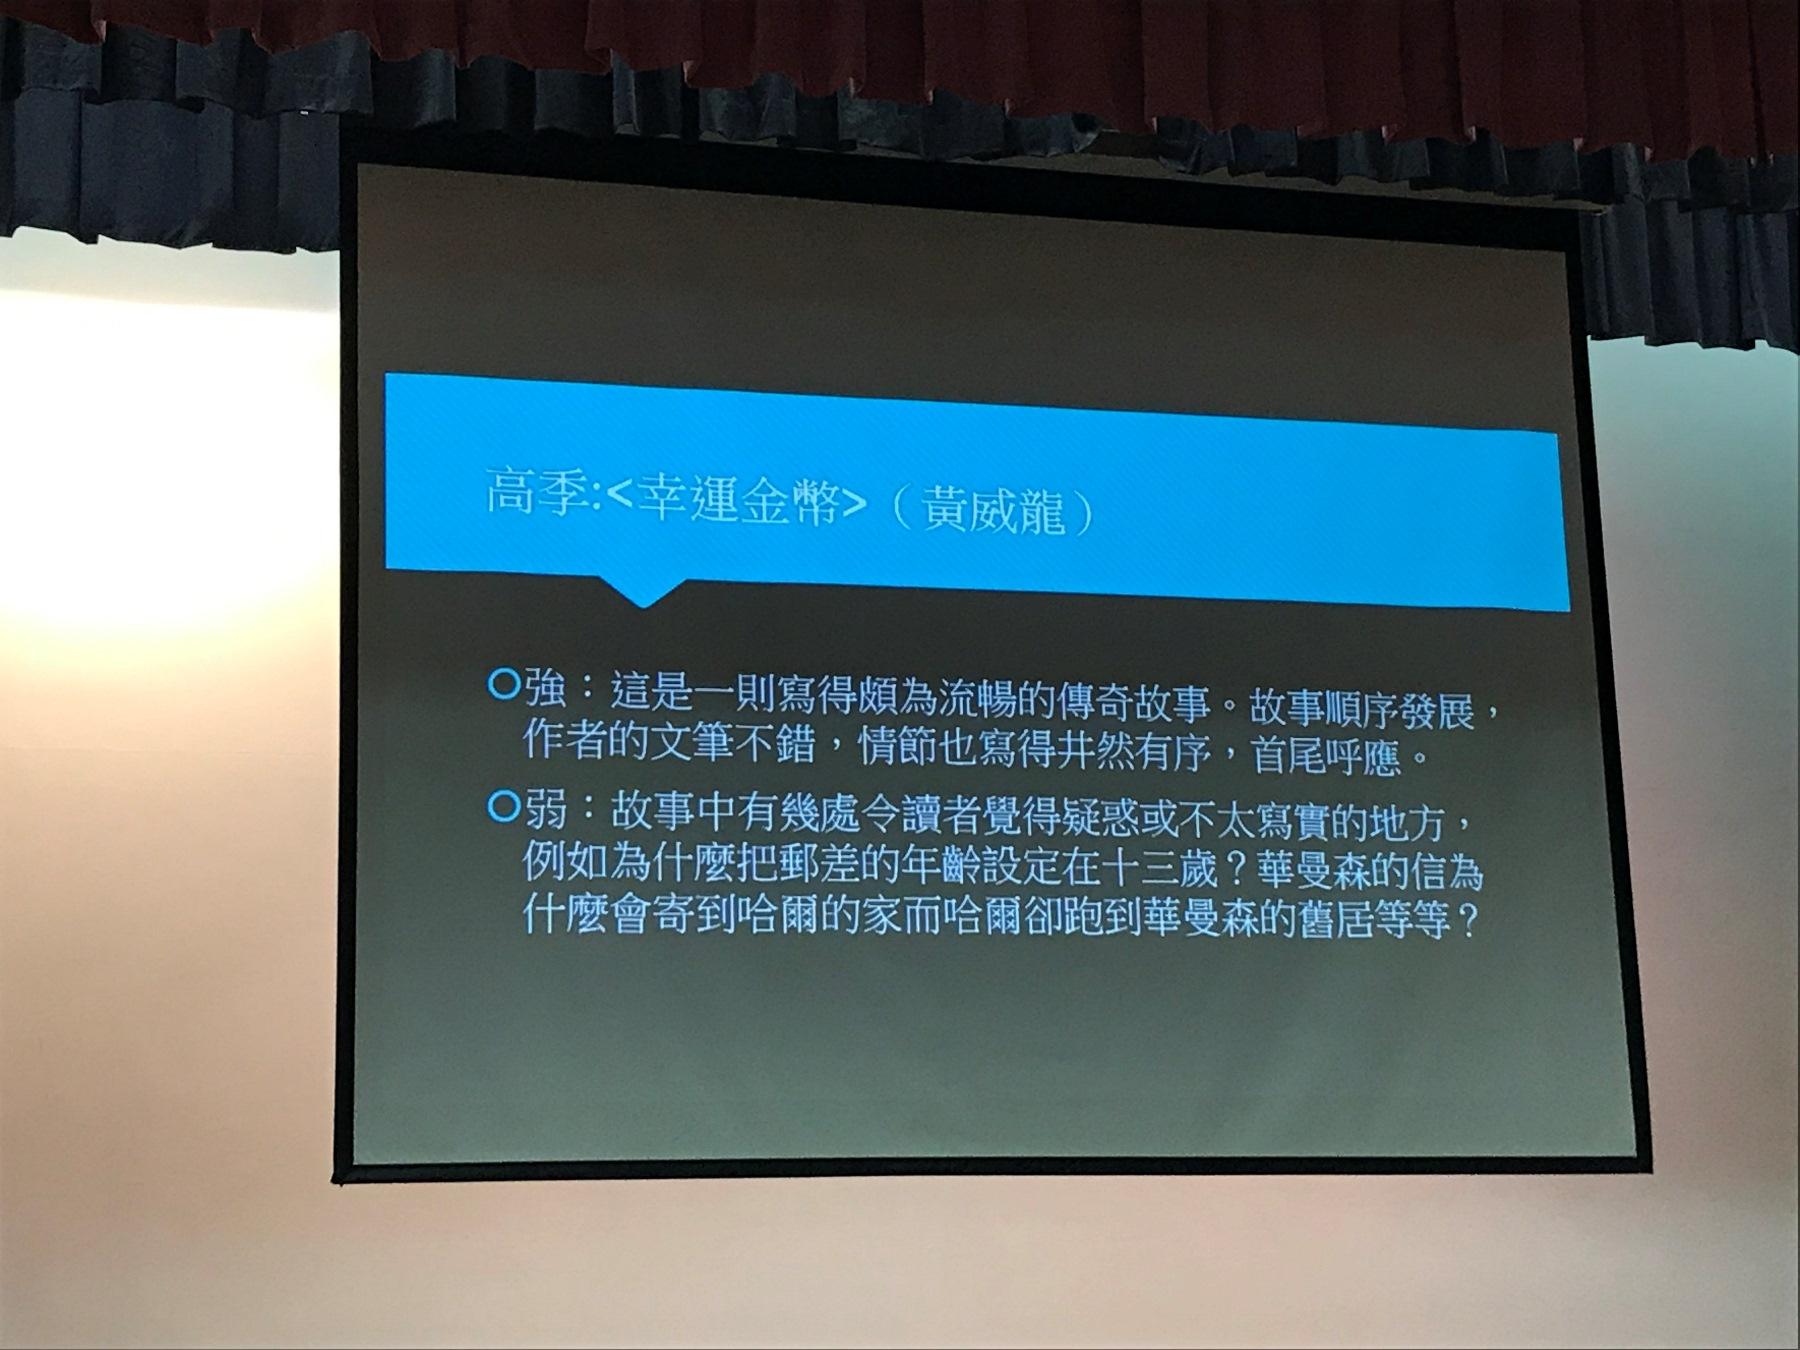 http://npc.edu.hk/sites/default/files/img_3887.jpg